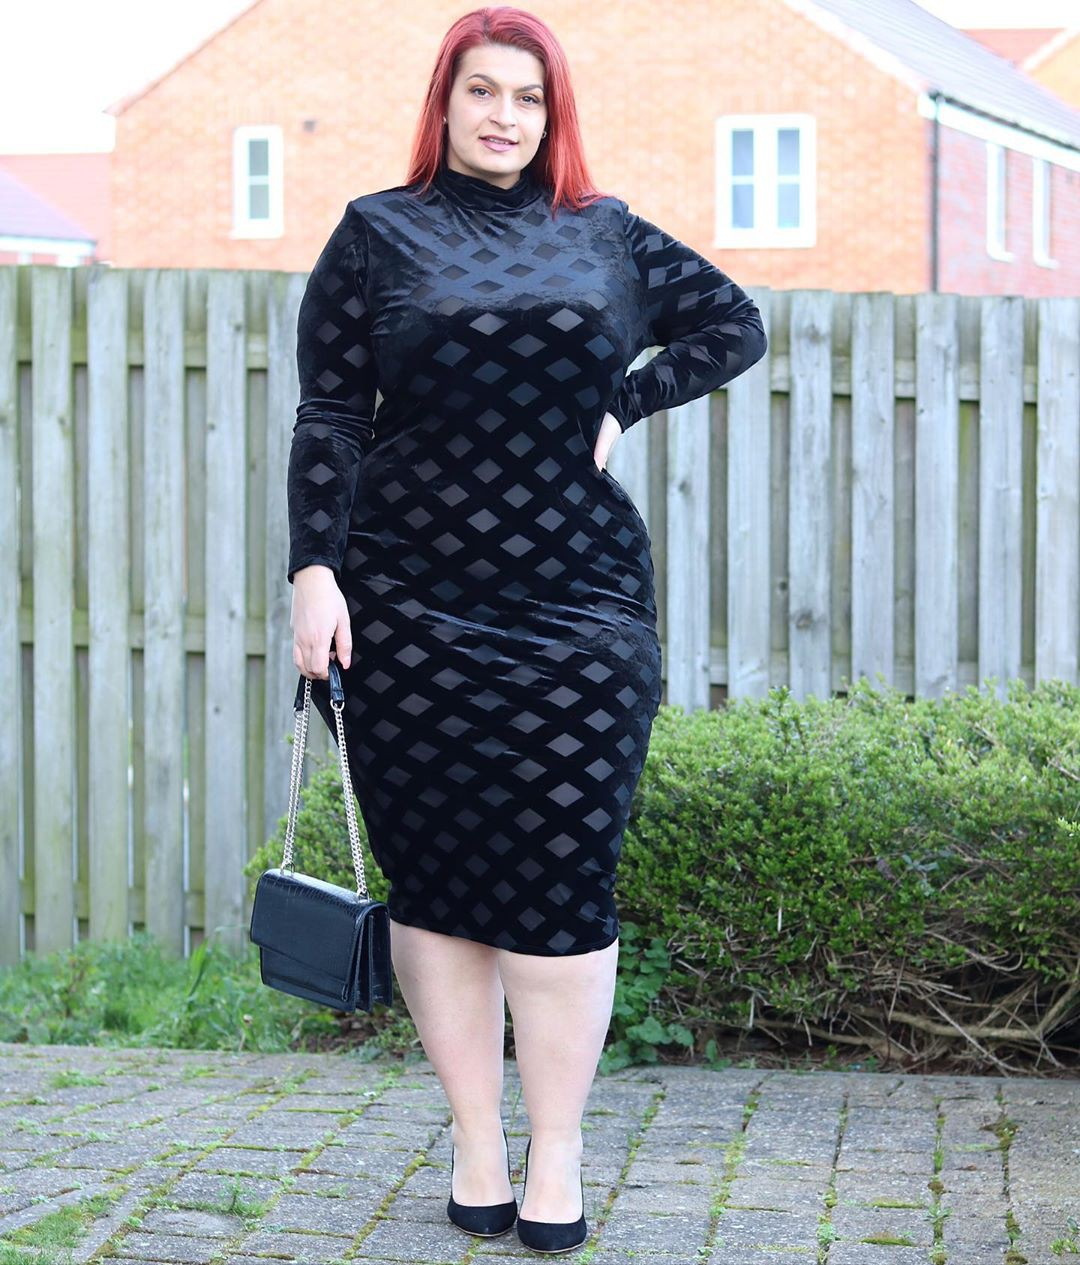 black dresses ideas with dress, fashion outfits, street fashion